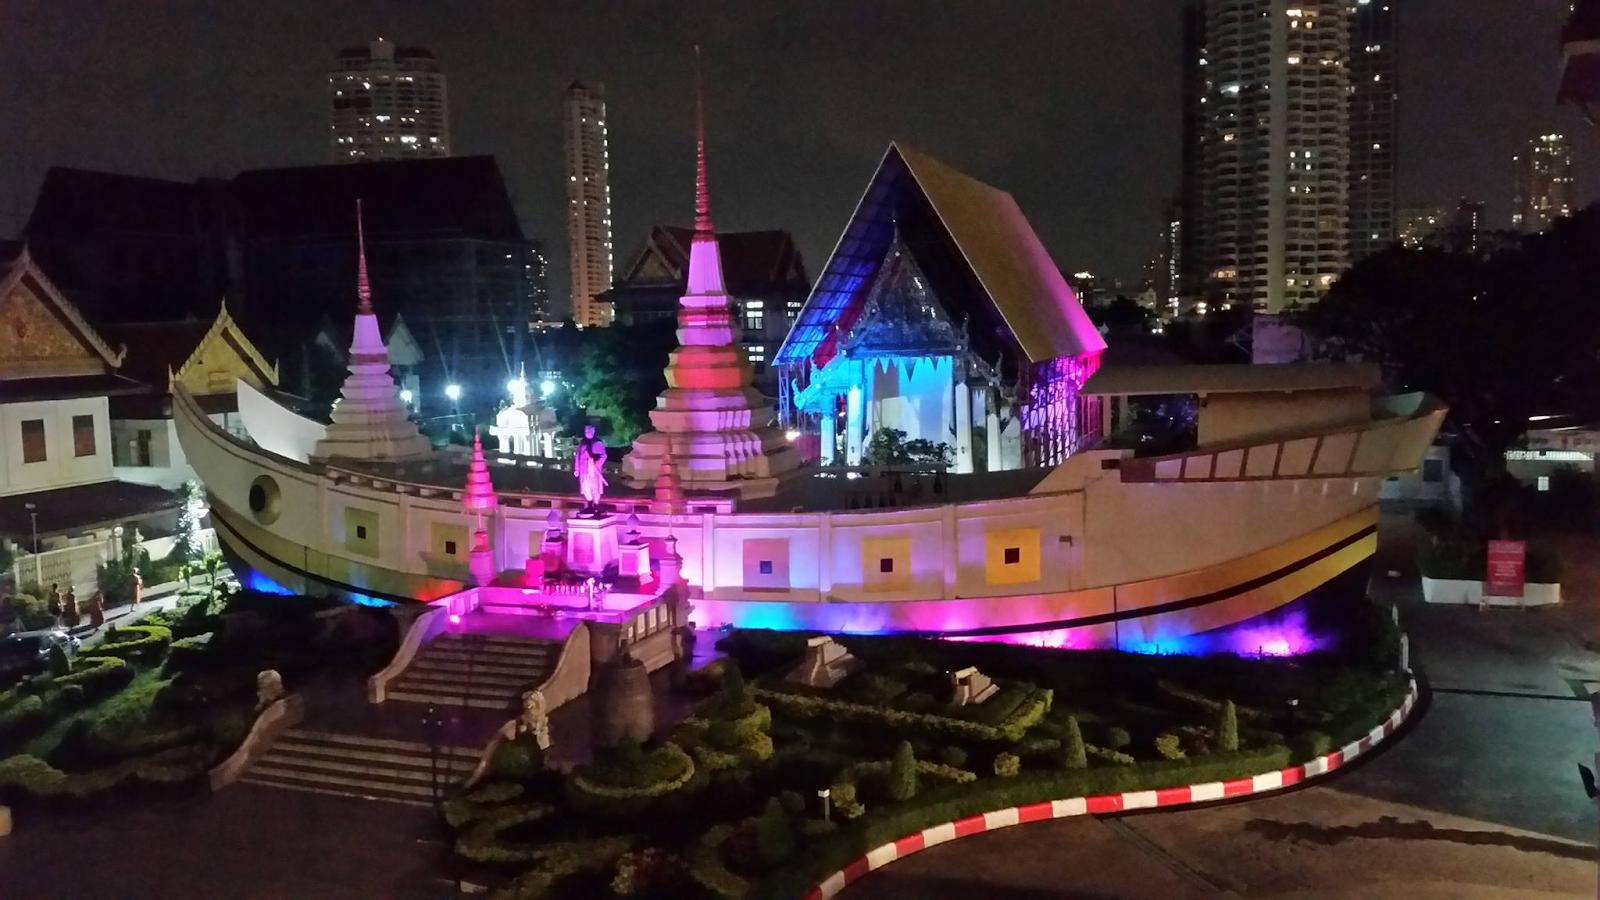 Chùa Thuyền - Wat Yannawa